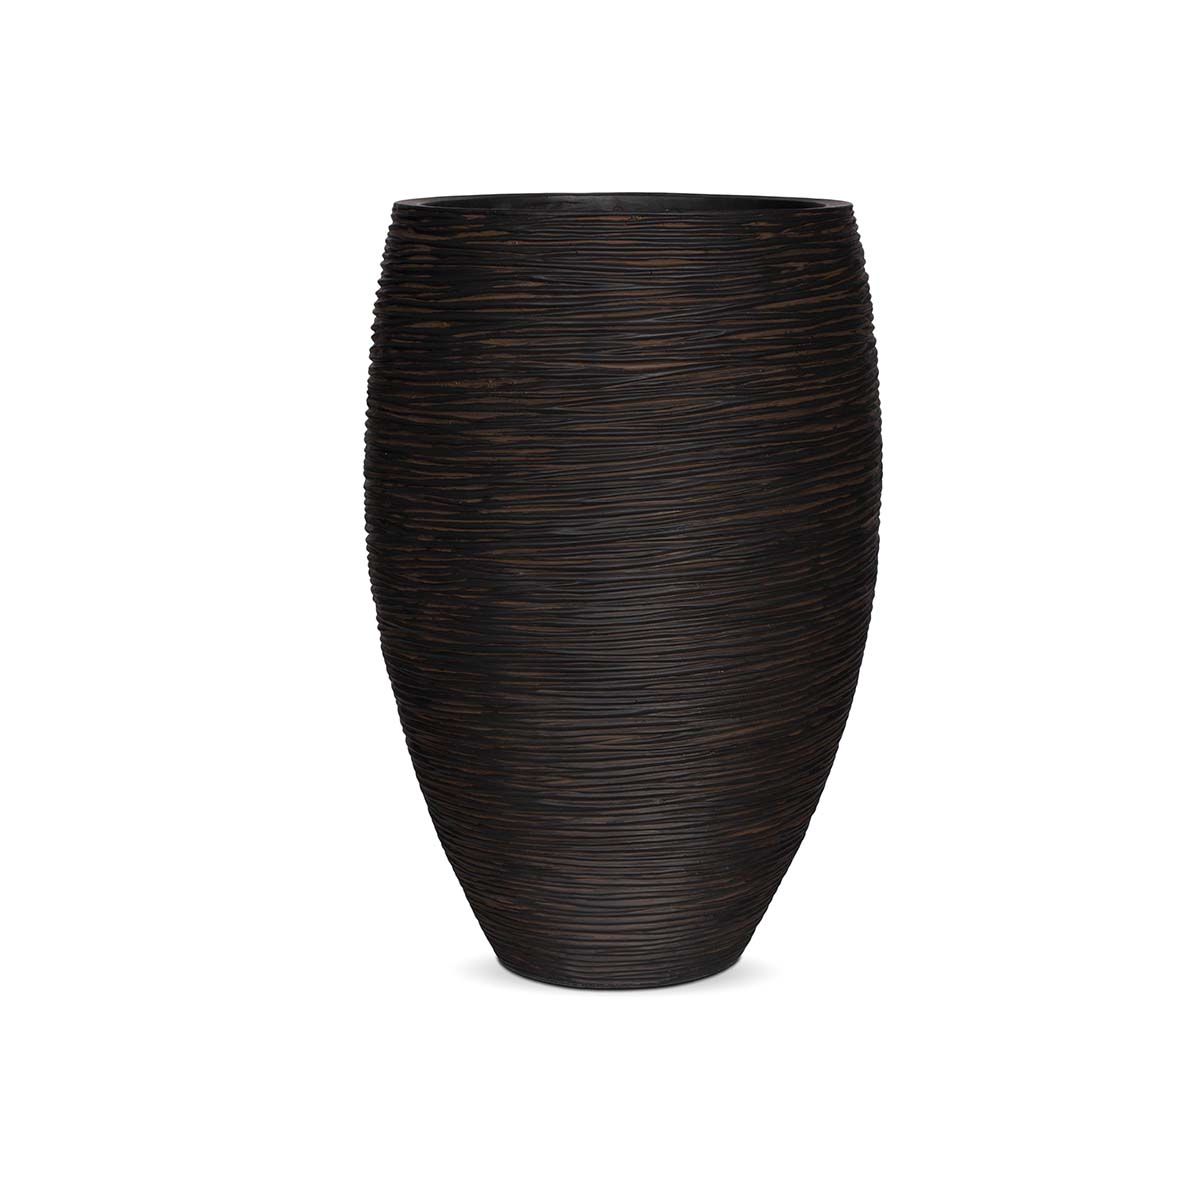 Pot elegant strié marron